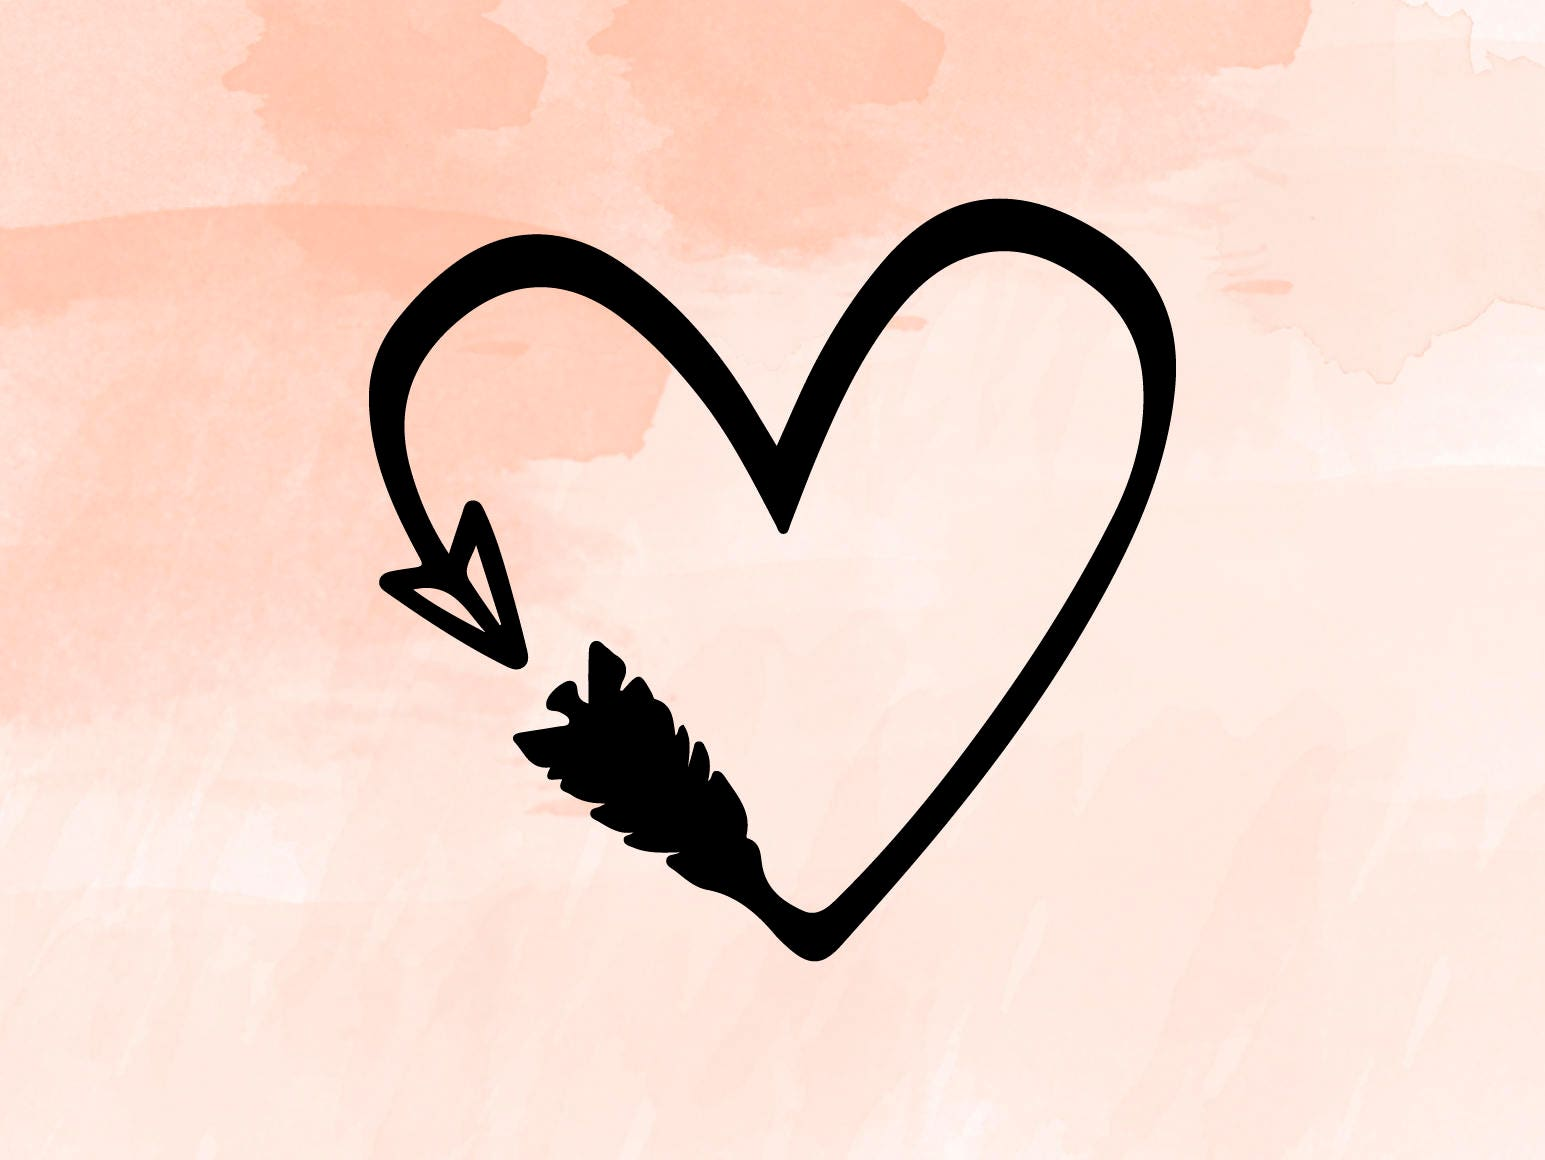 Download Heart SVG Heart Cut File Love Svg Files Love Clipart